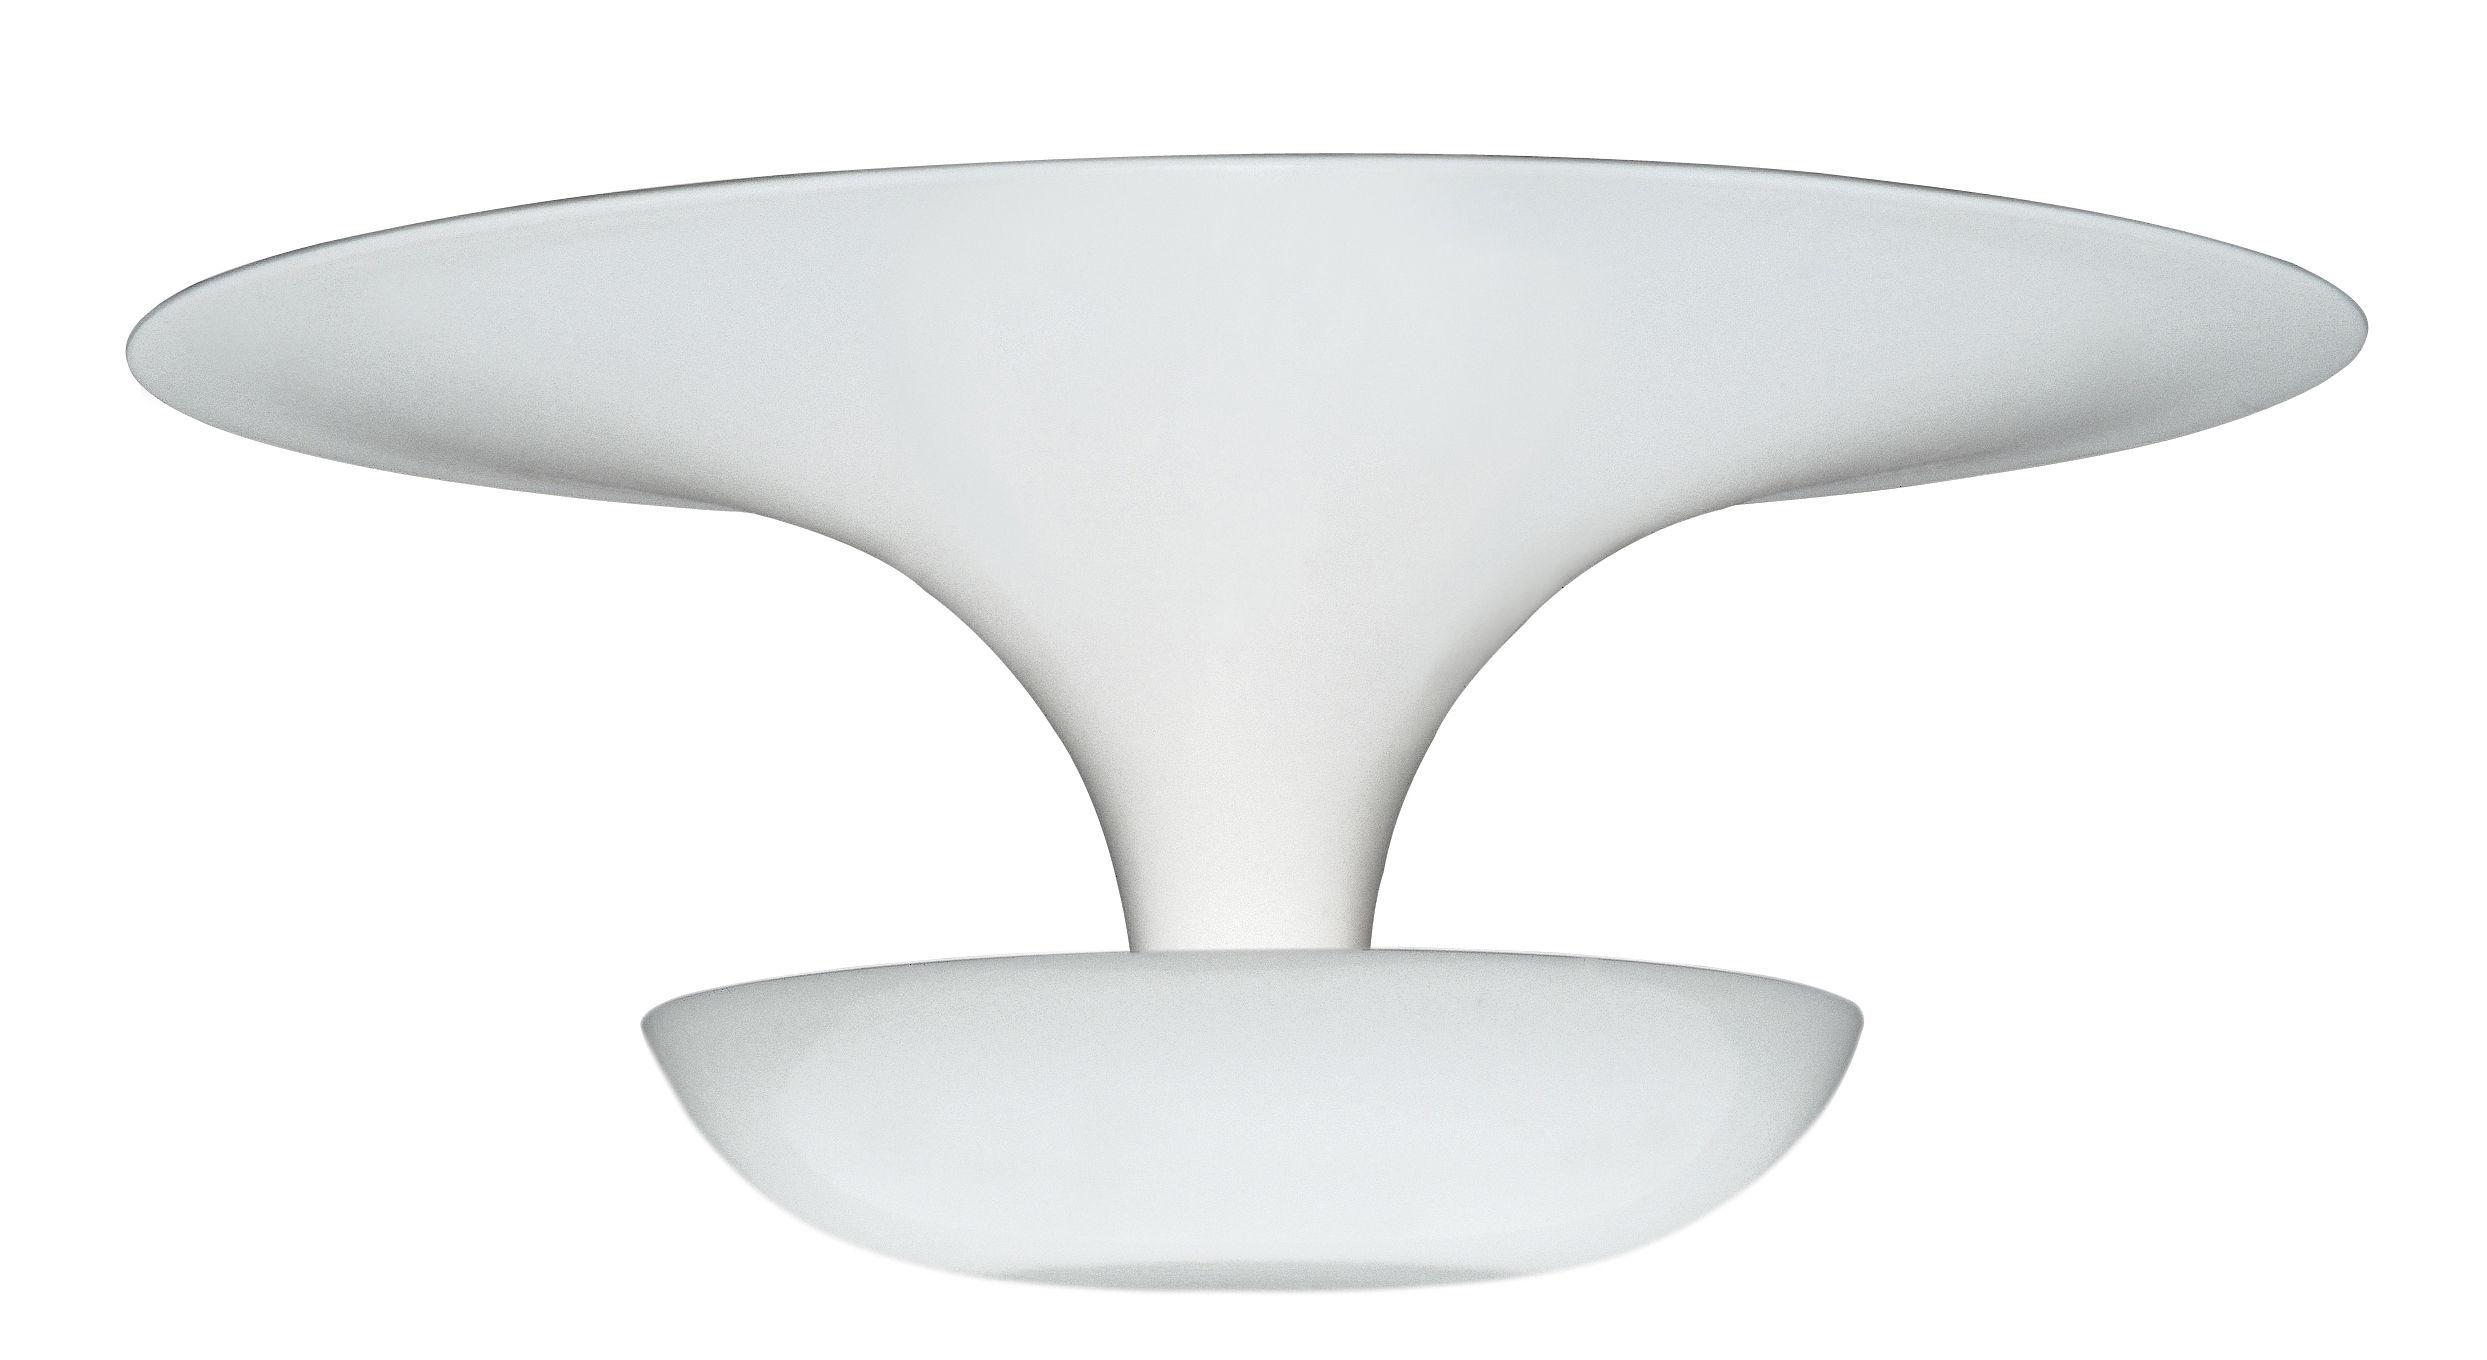 Luminaire - Plafonniers - Plafonnier Funnel Mini / LED - Ø 22 cm - Vibia - Blanc - Aluminium peint